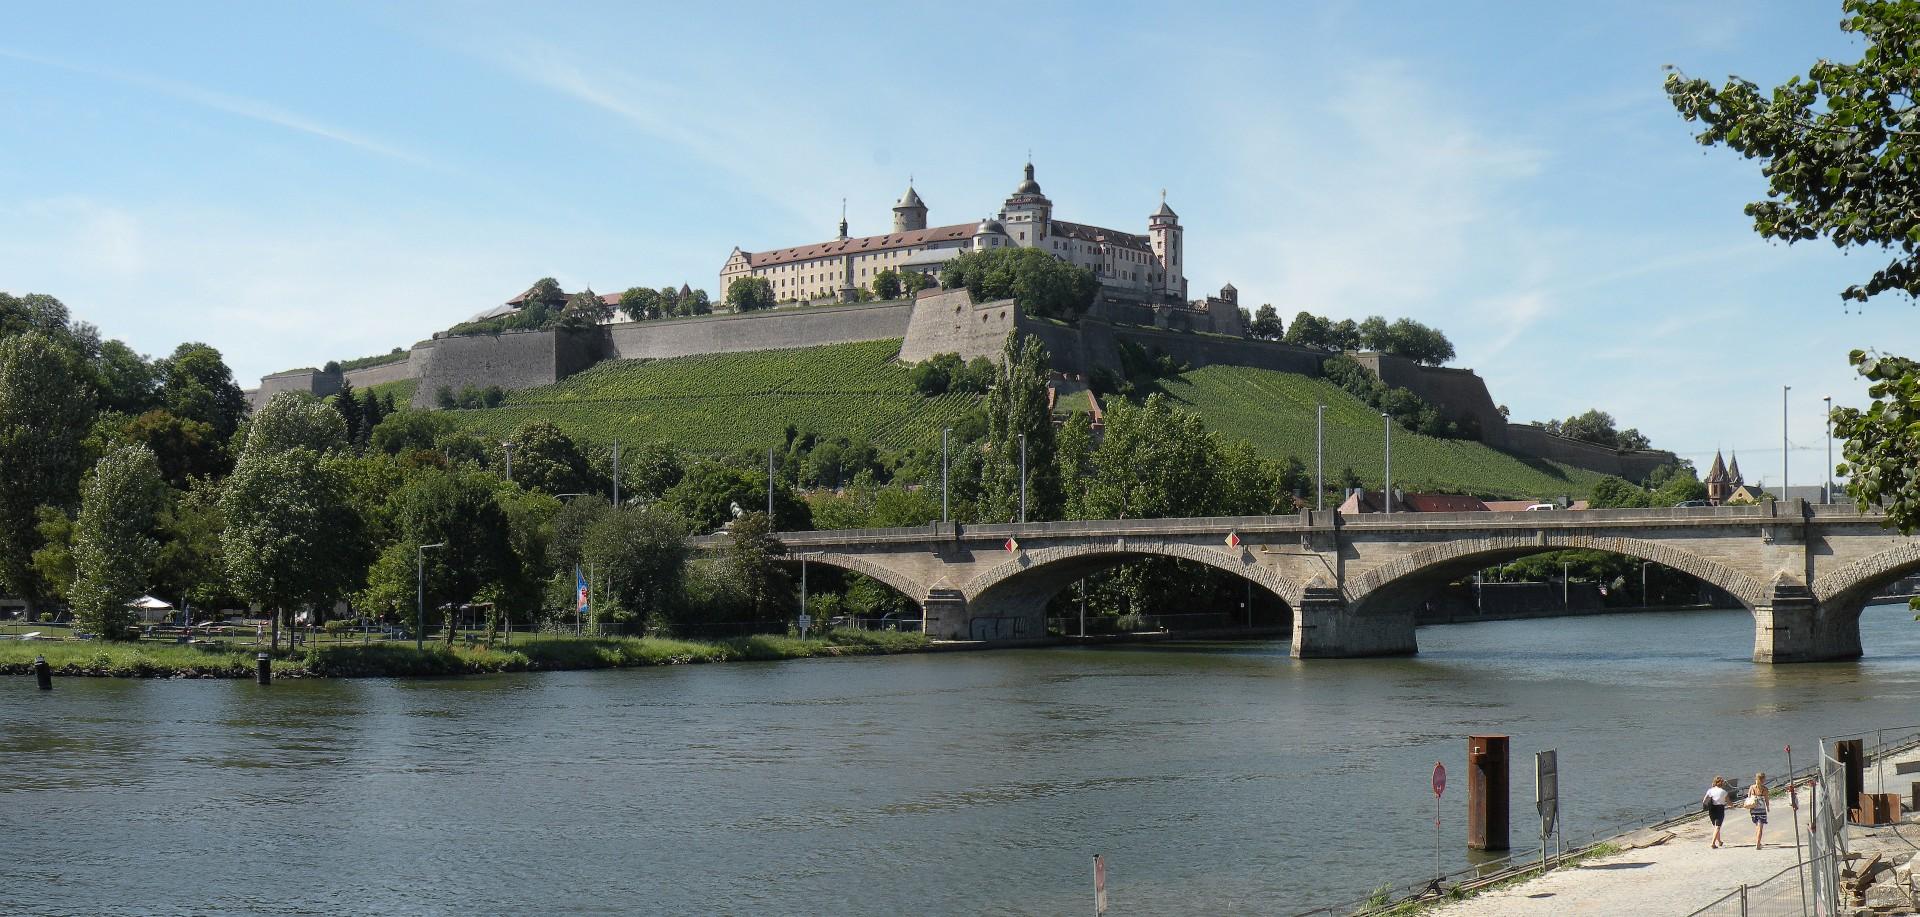 Festung Marienberg - Bild von Vitold Muratov Lizenz: CC BY-SA 3.0